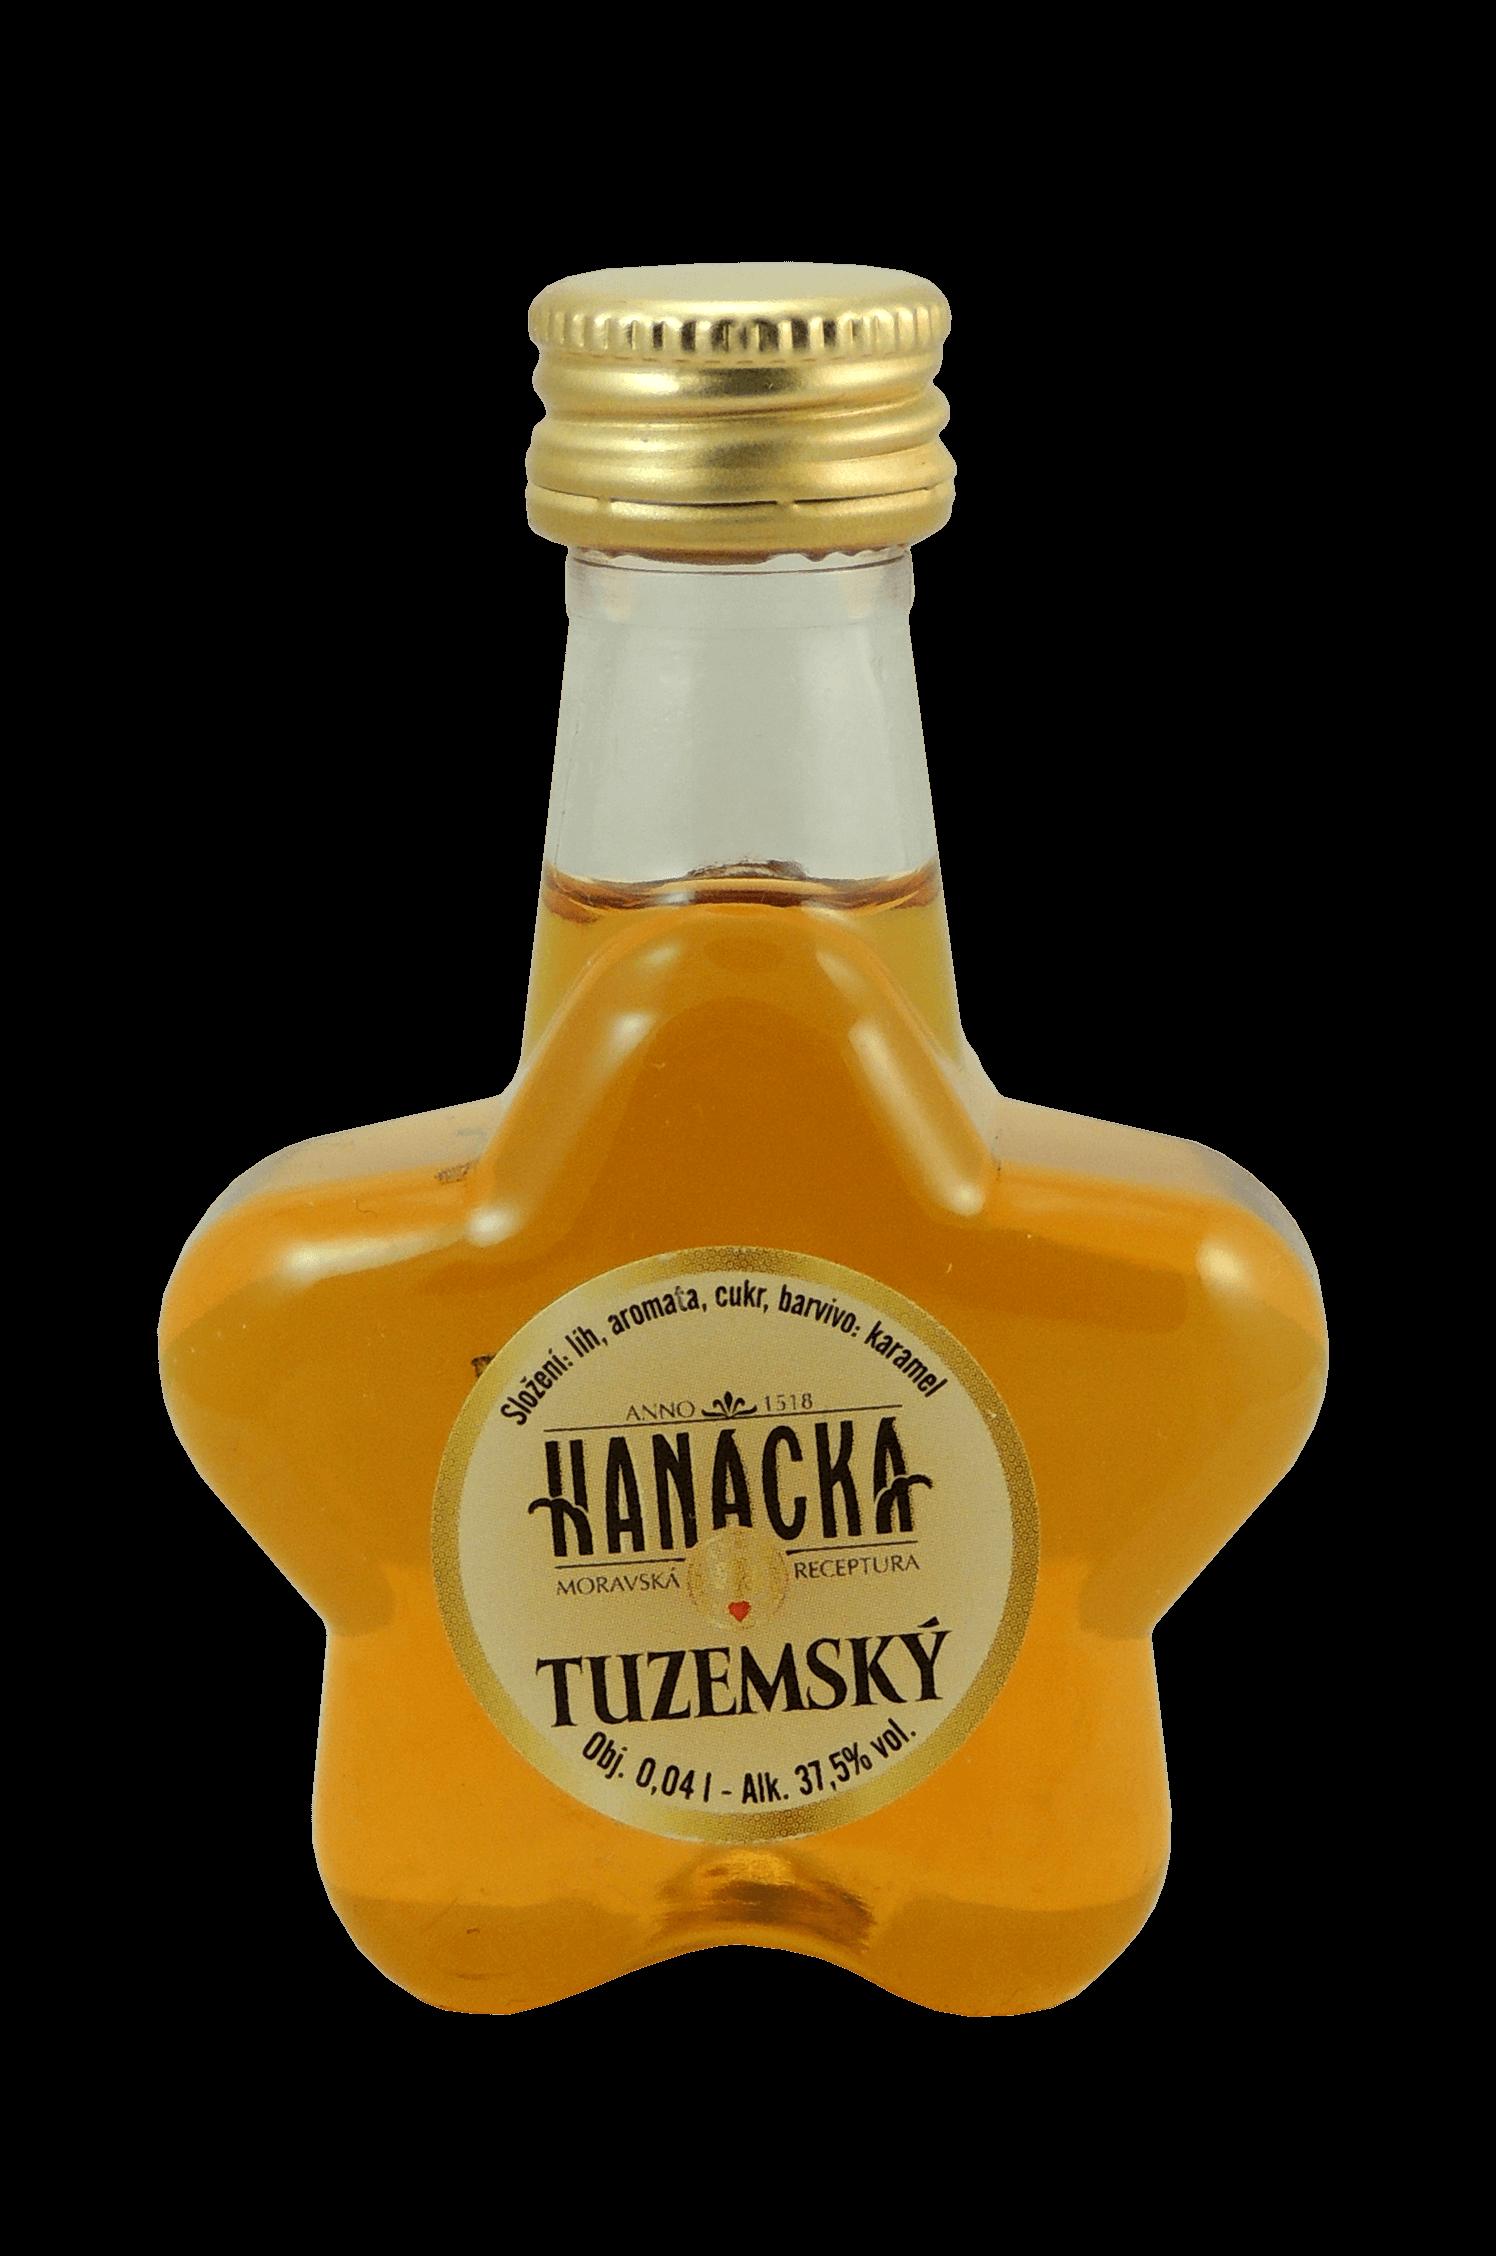 Hanacka Tuzemský